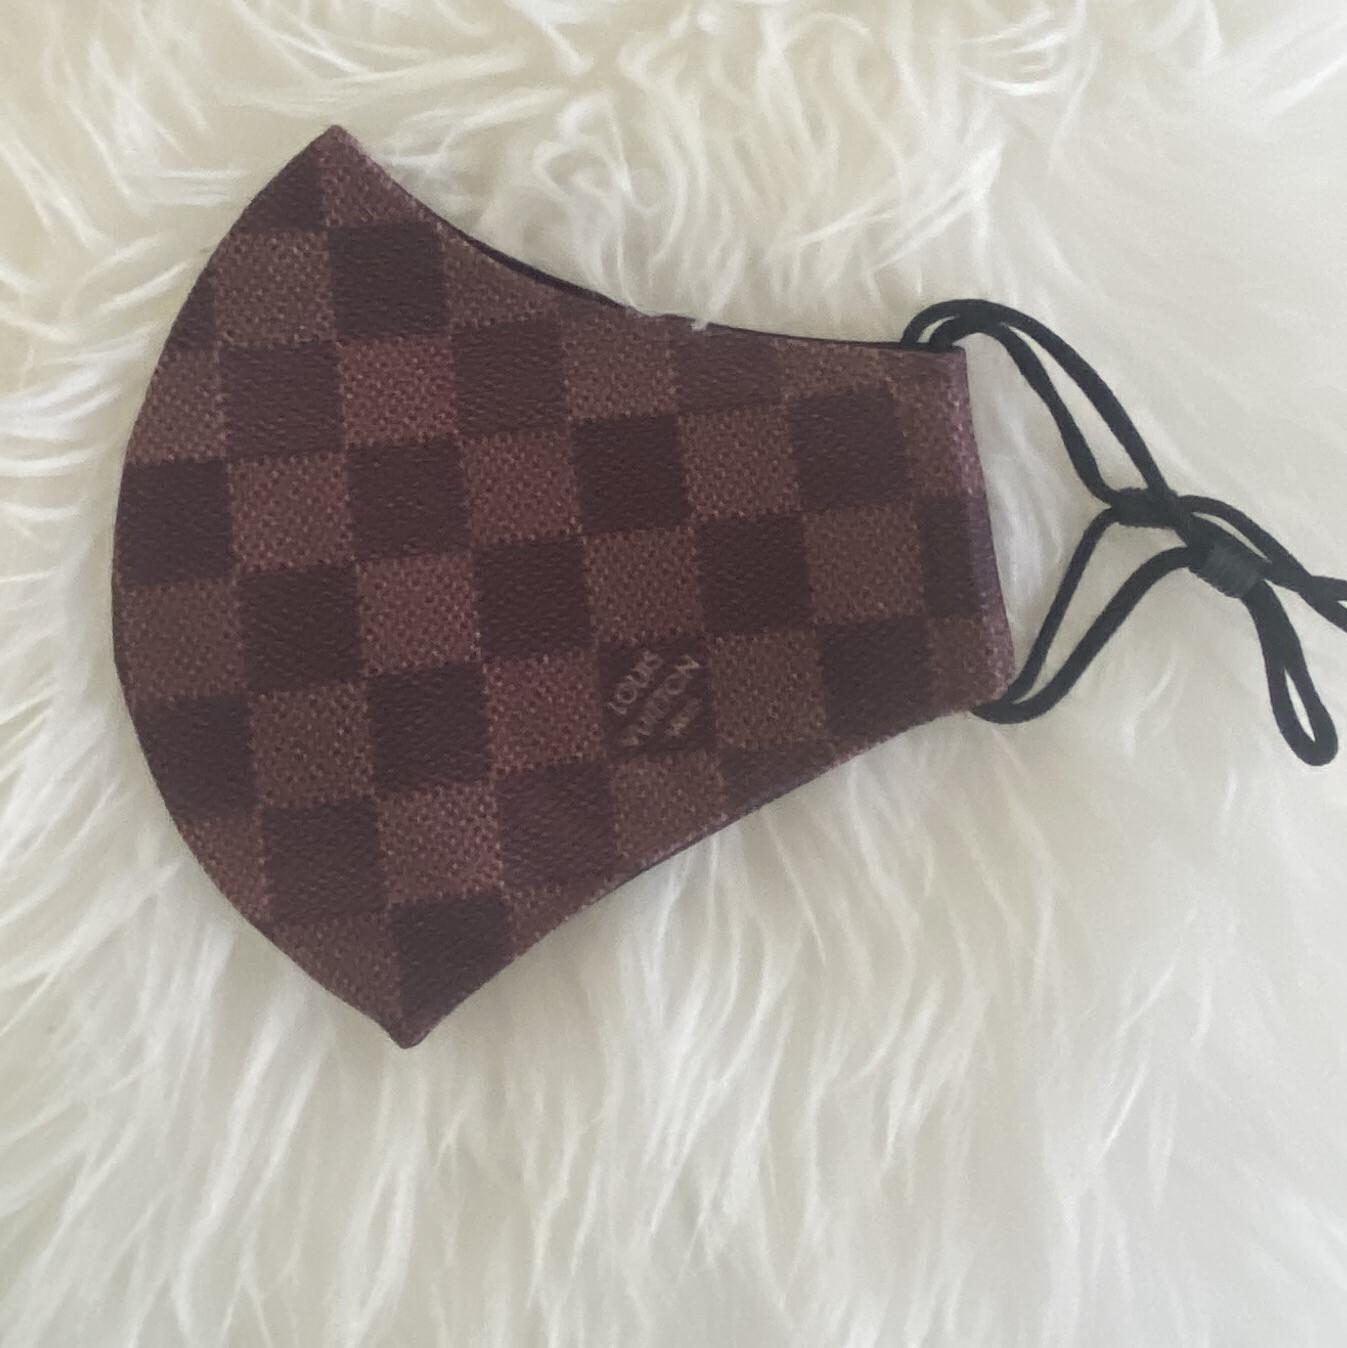 Checkered LV Mask